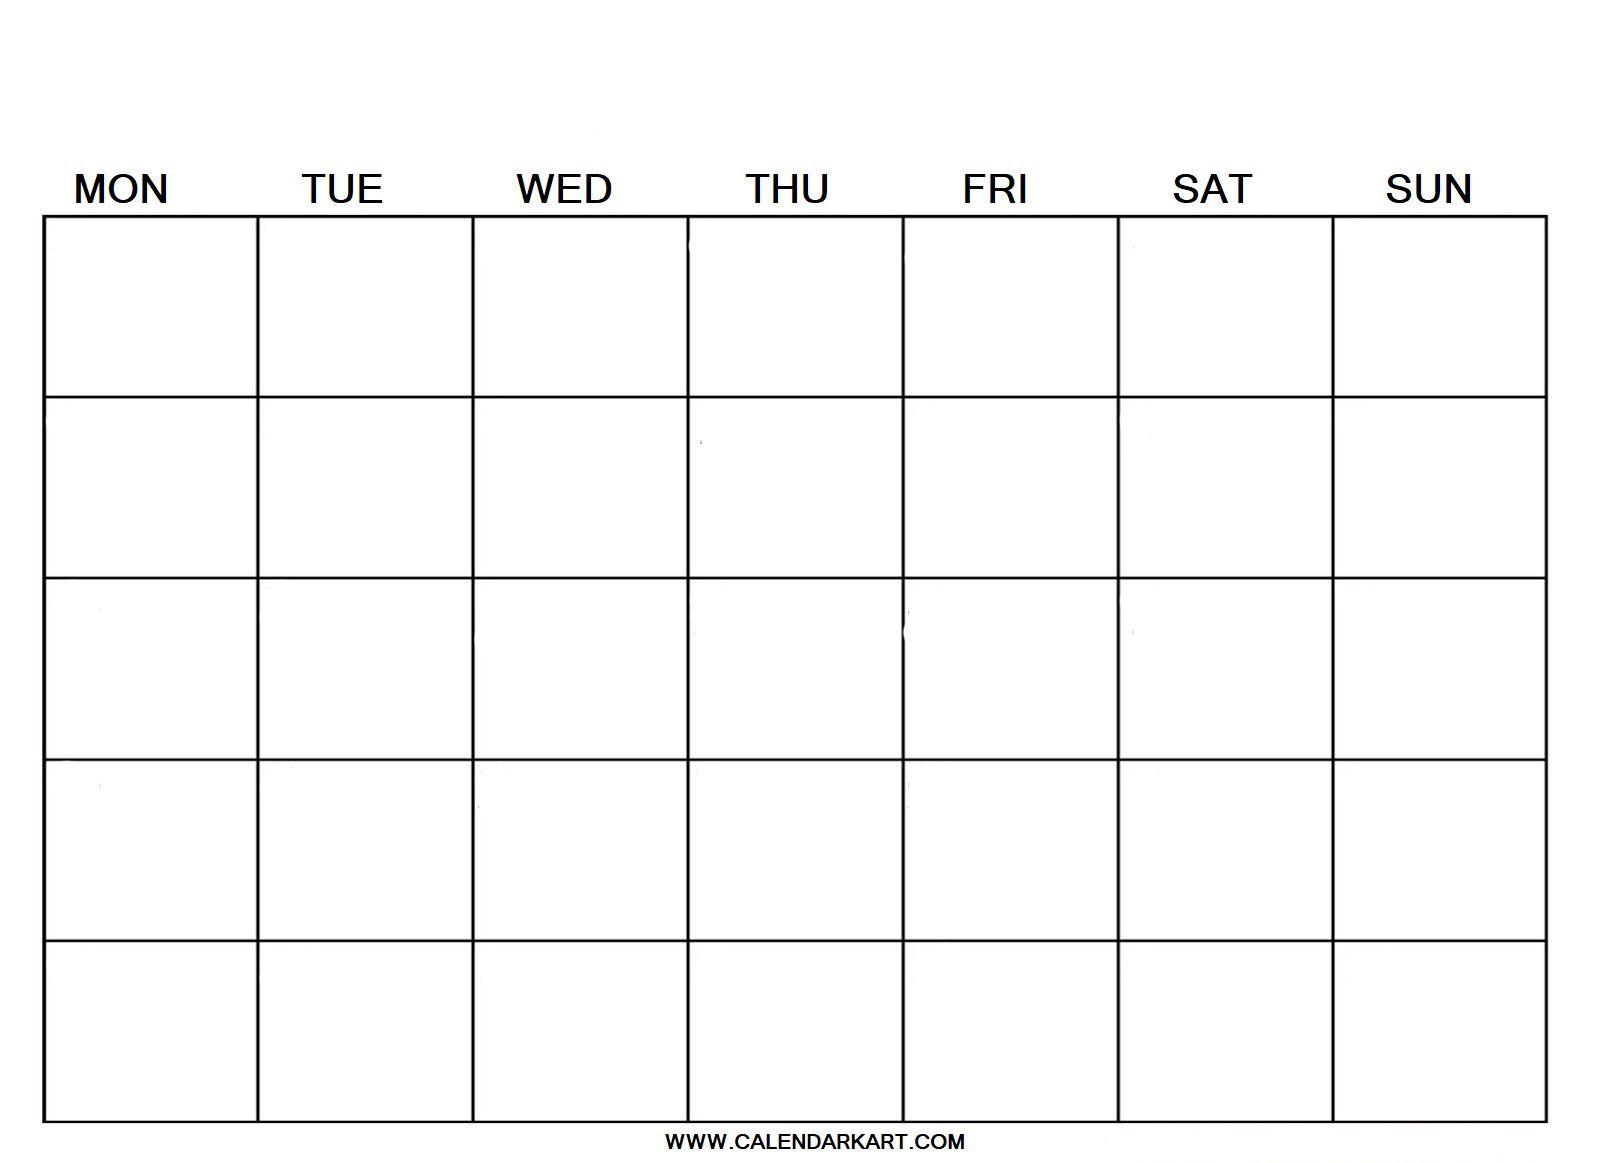 007 Breathtaking Blank Calendar Template Pdf Idea  Free YearlyFull